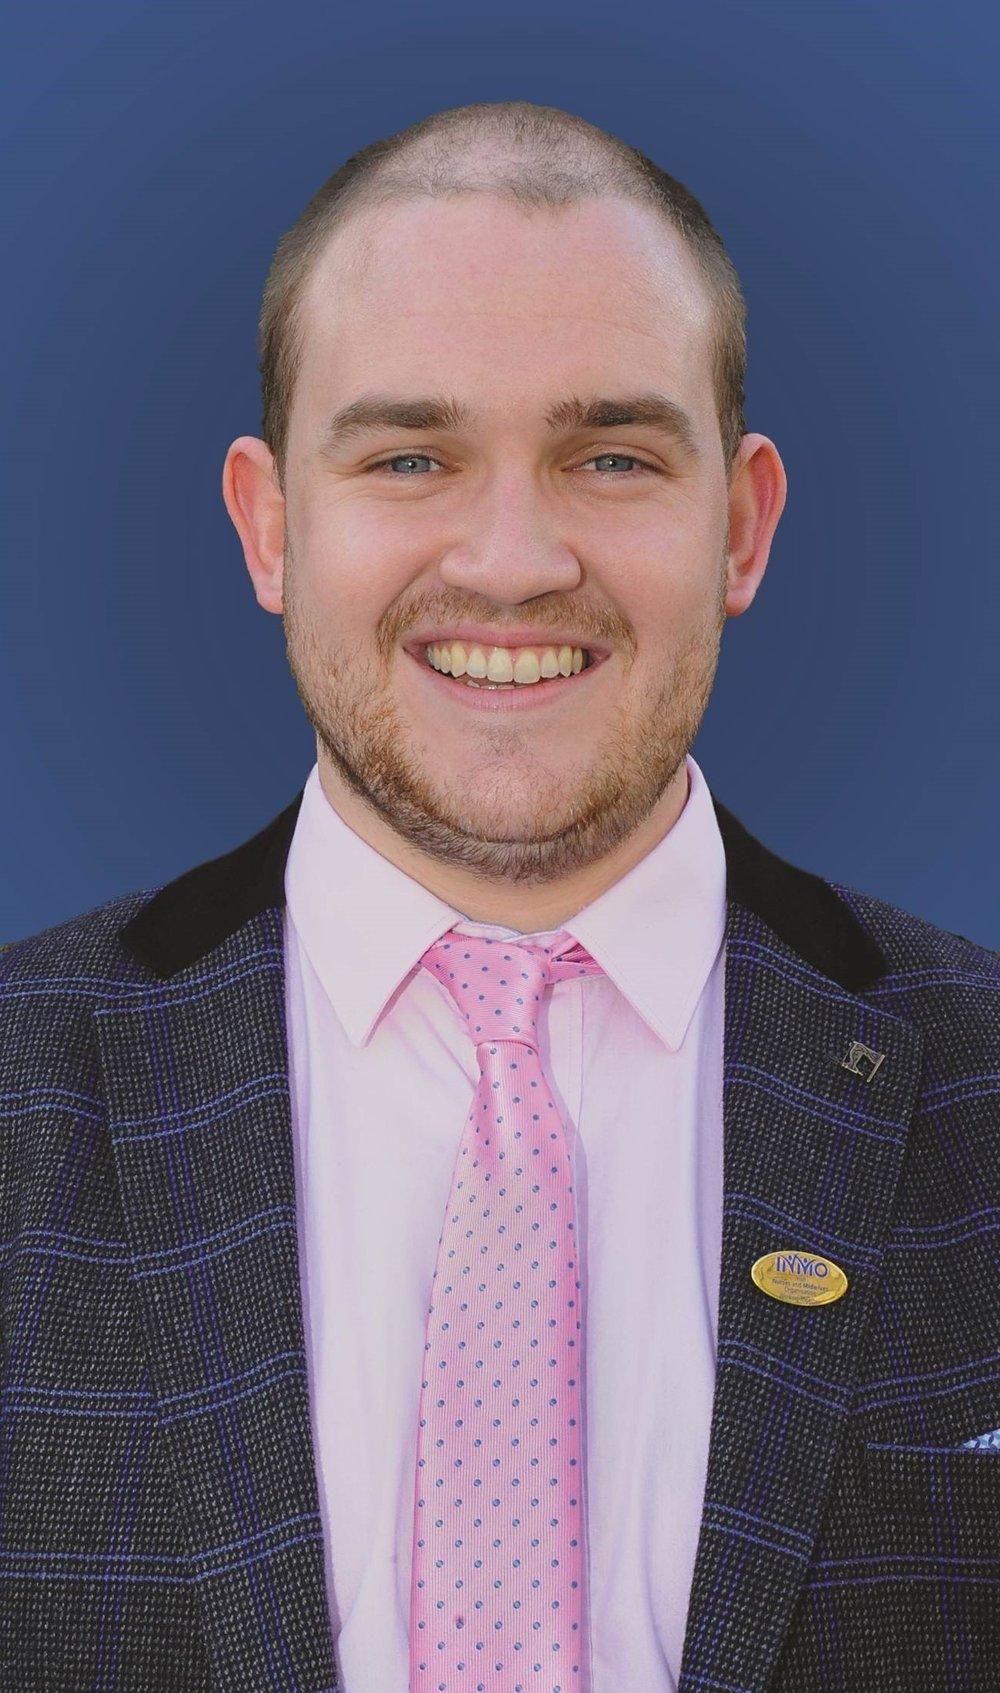 Liam Conway   Vice President 2017-2020  Novice Nurse- Dublin,Ireland Graduate Studies